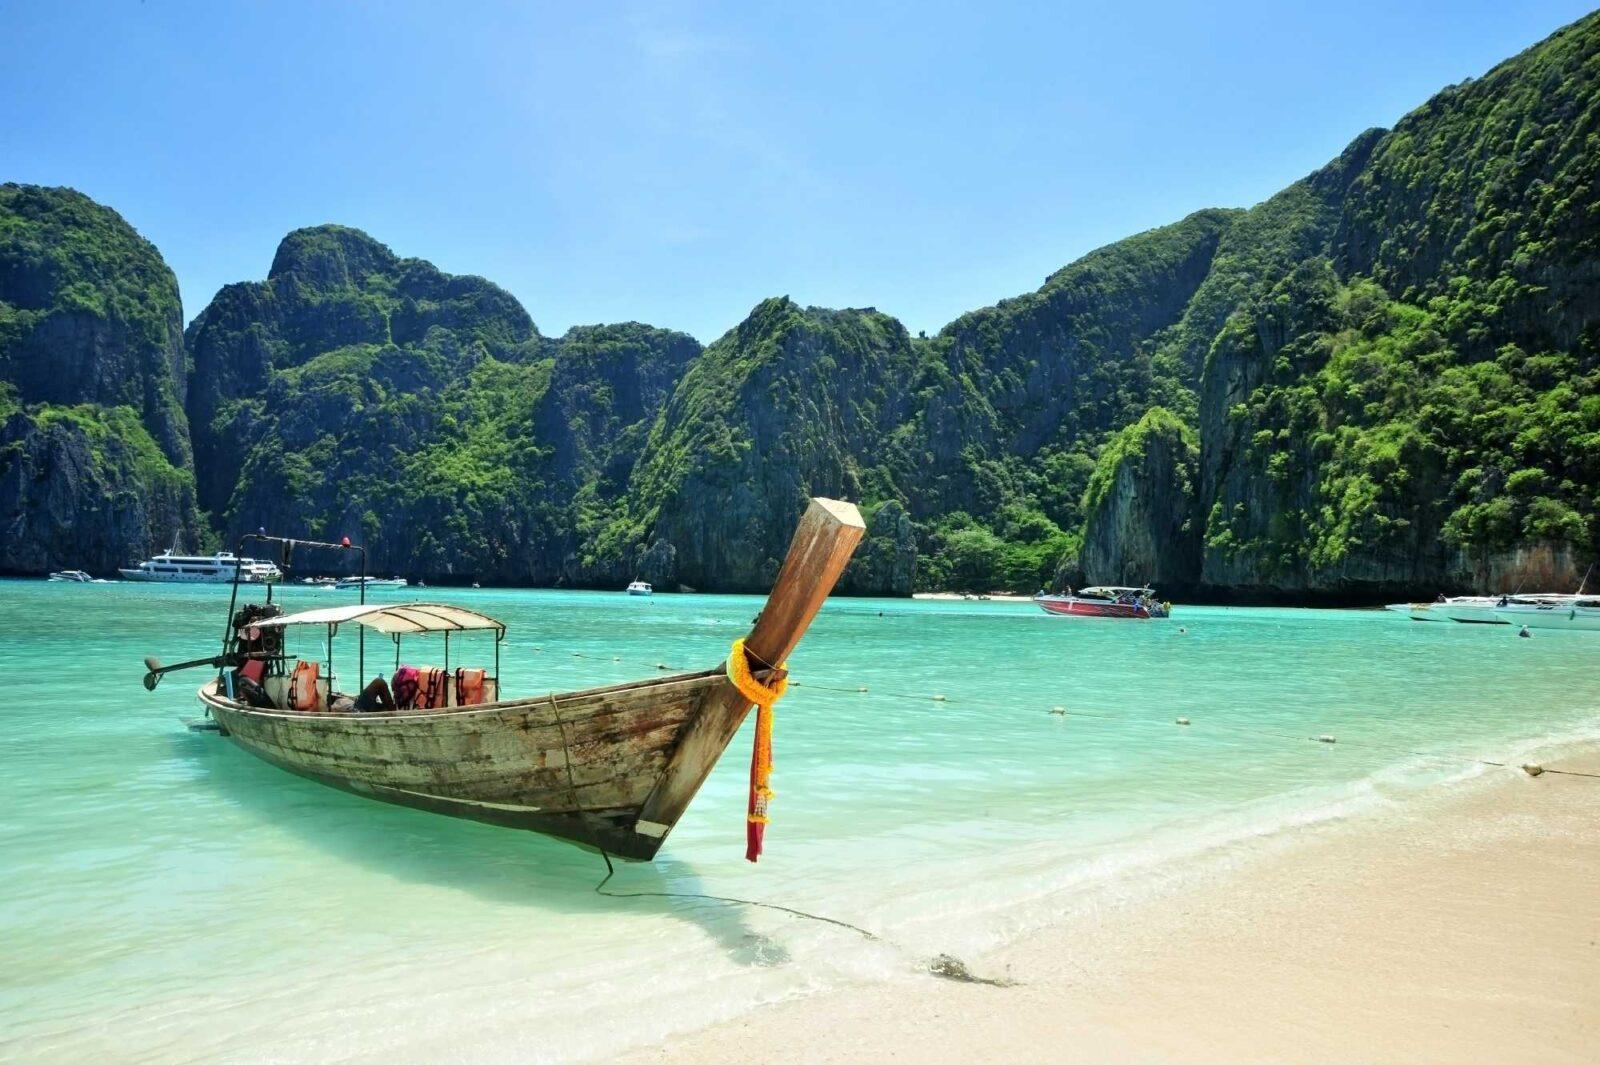 смотреть картинки тайланда